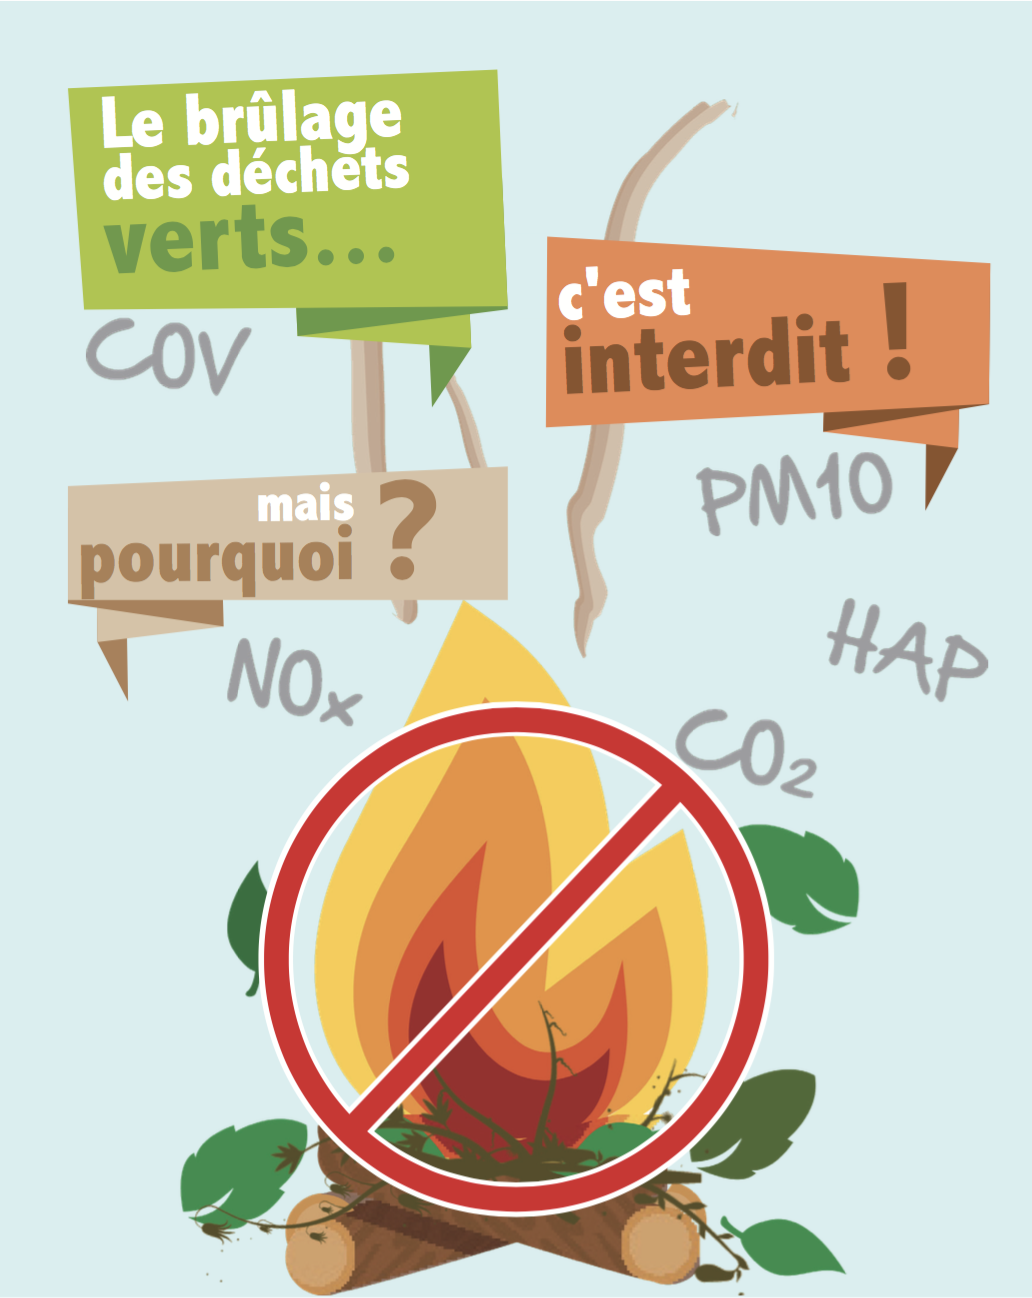 Brulage_dechets_verts.png